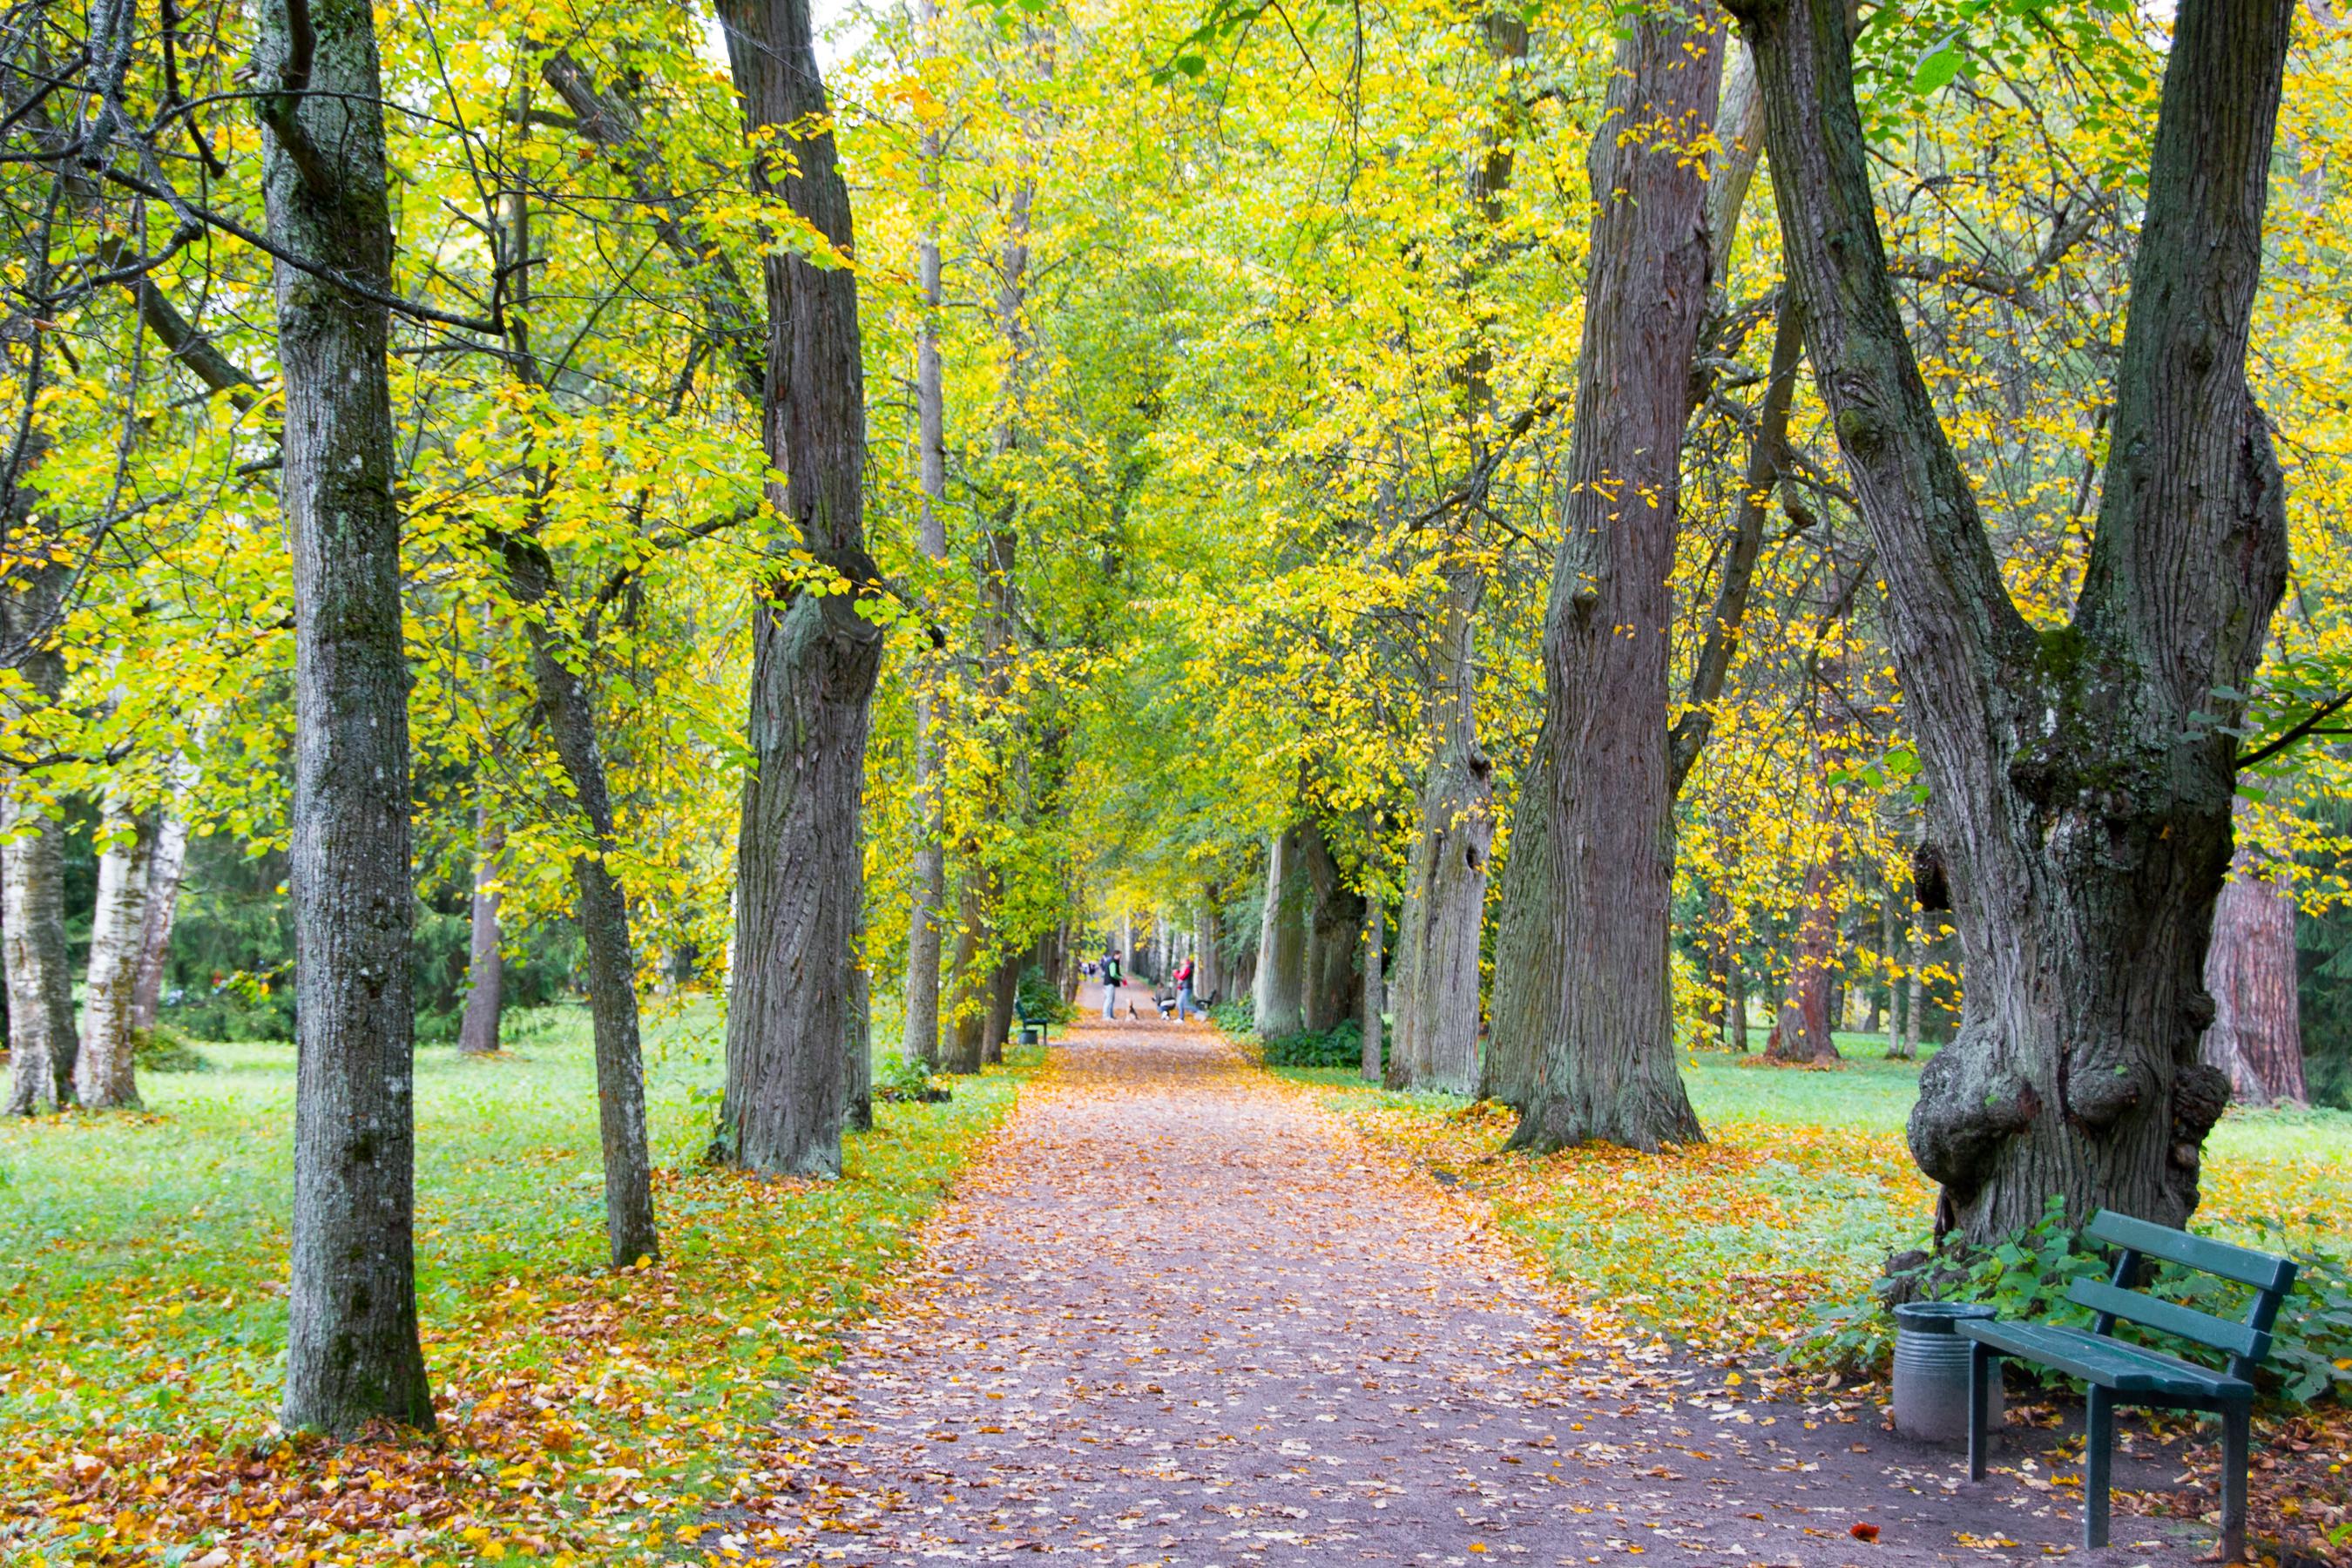 autumn park, Autumn, Orange, Woods, Vibrant, HQ Photo